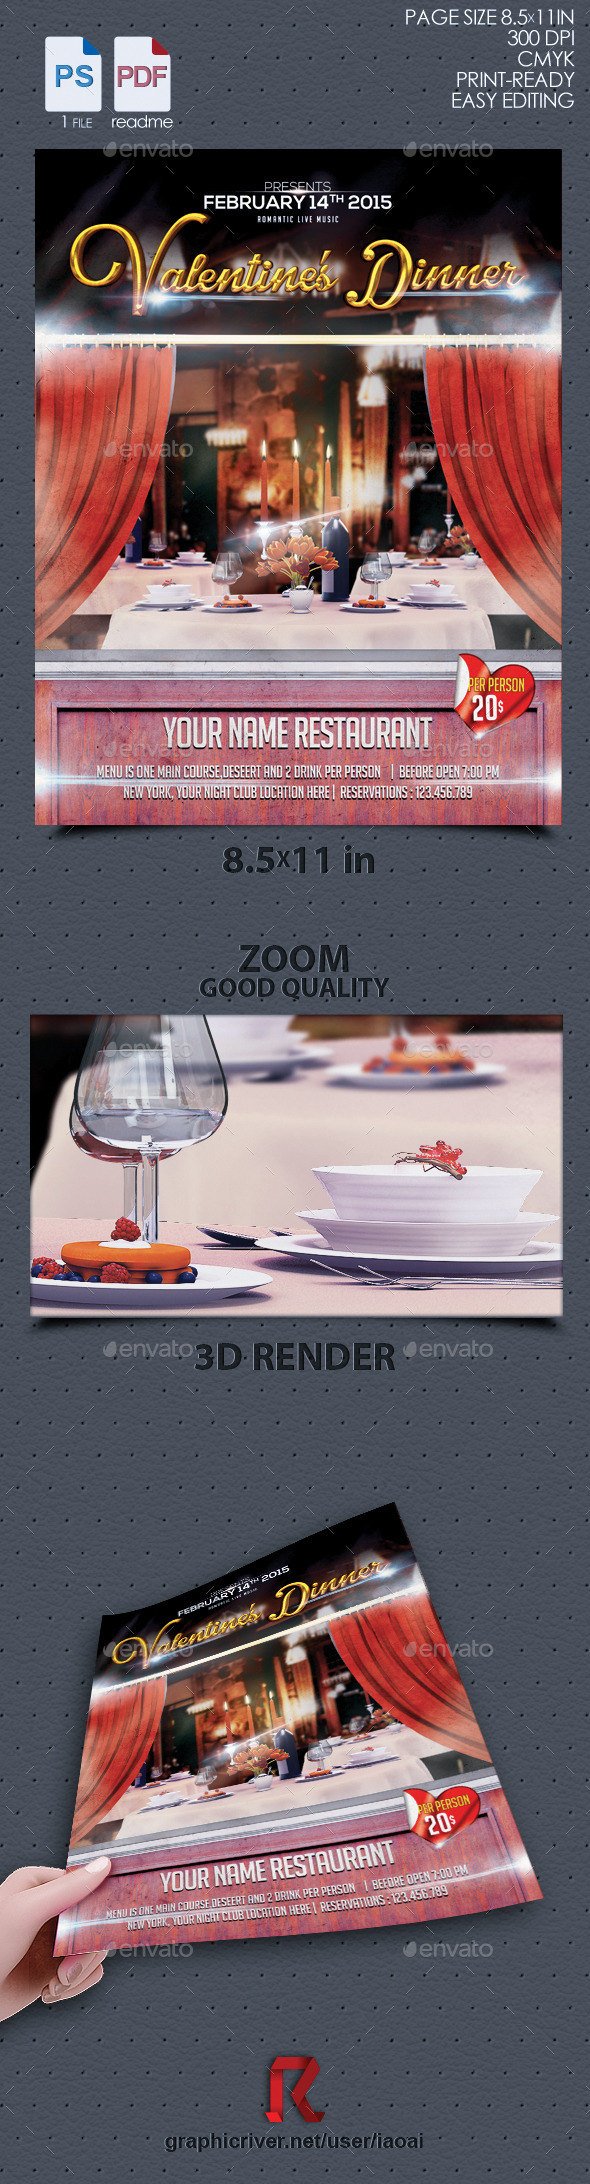 GraphicRiver Valentine dinner Flyer vol 3 10185623